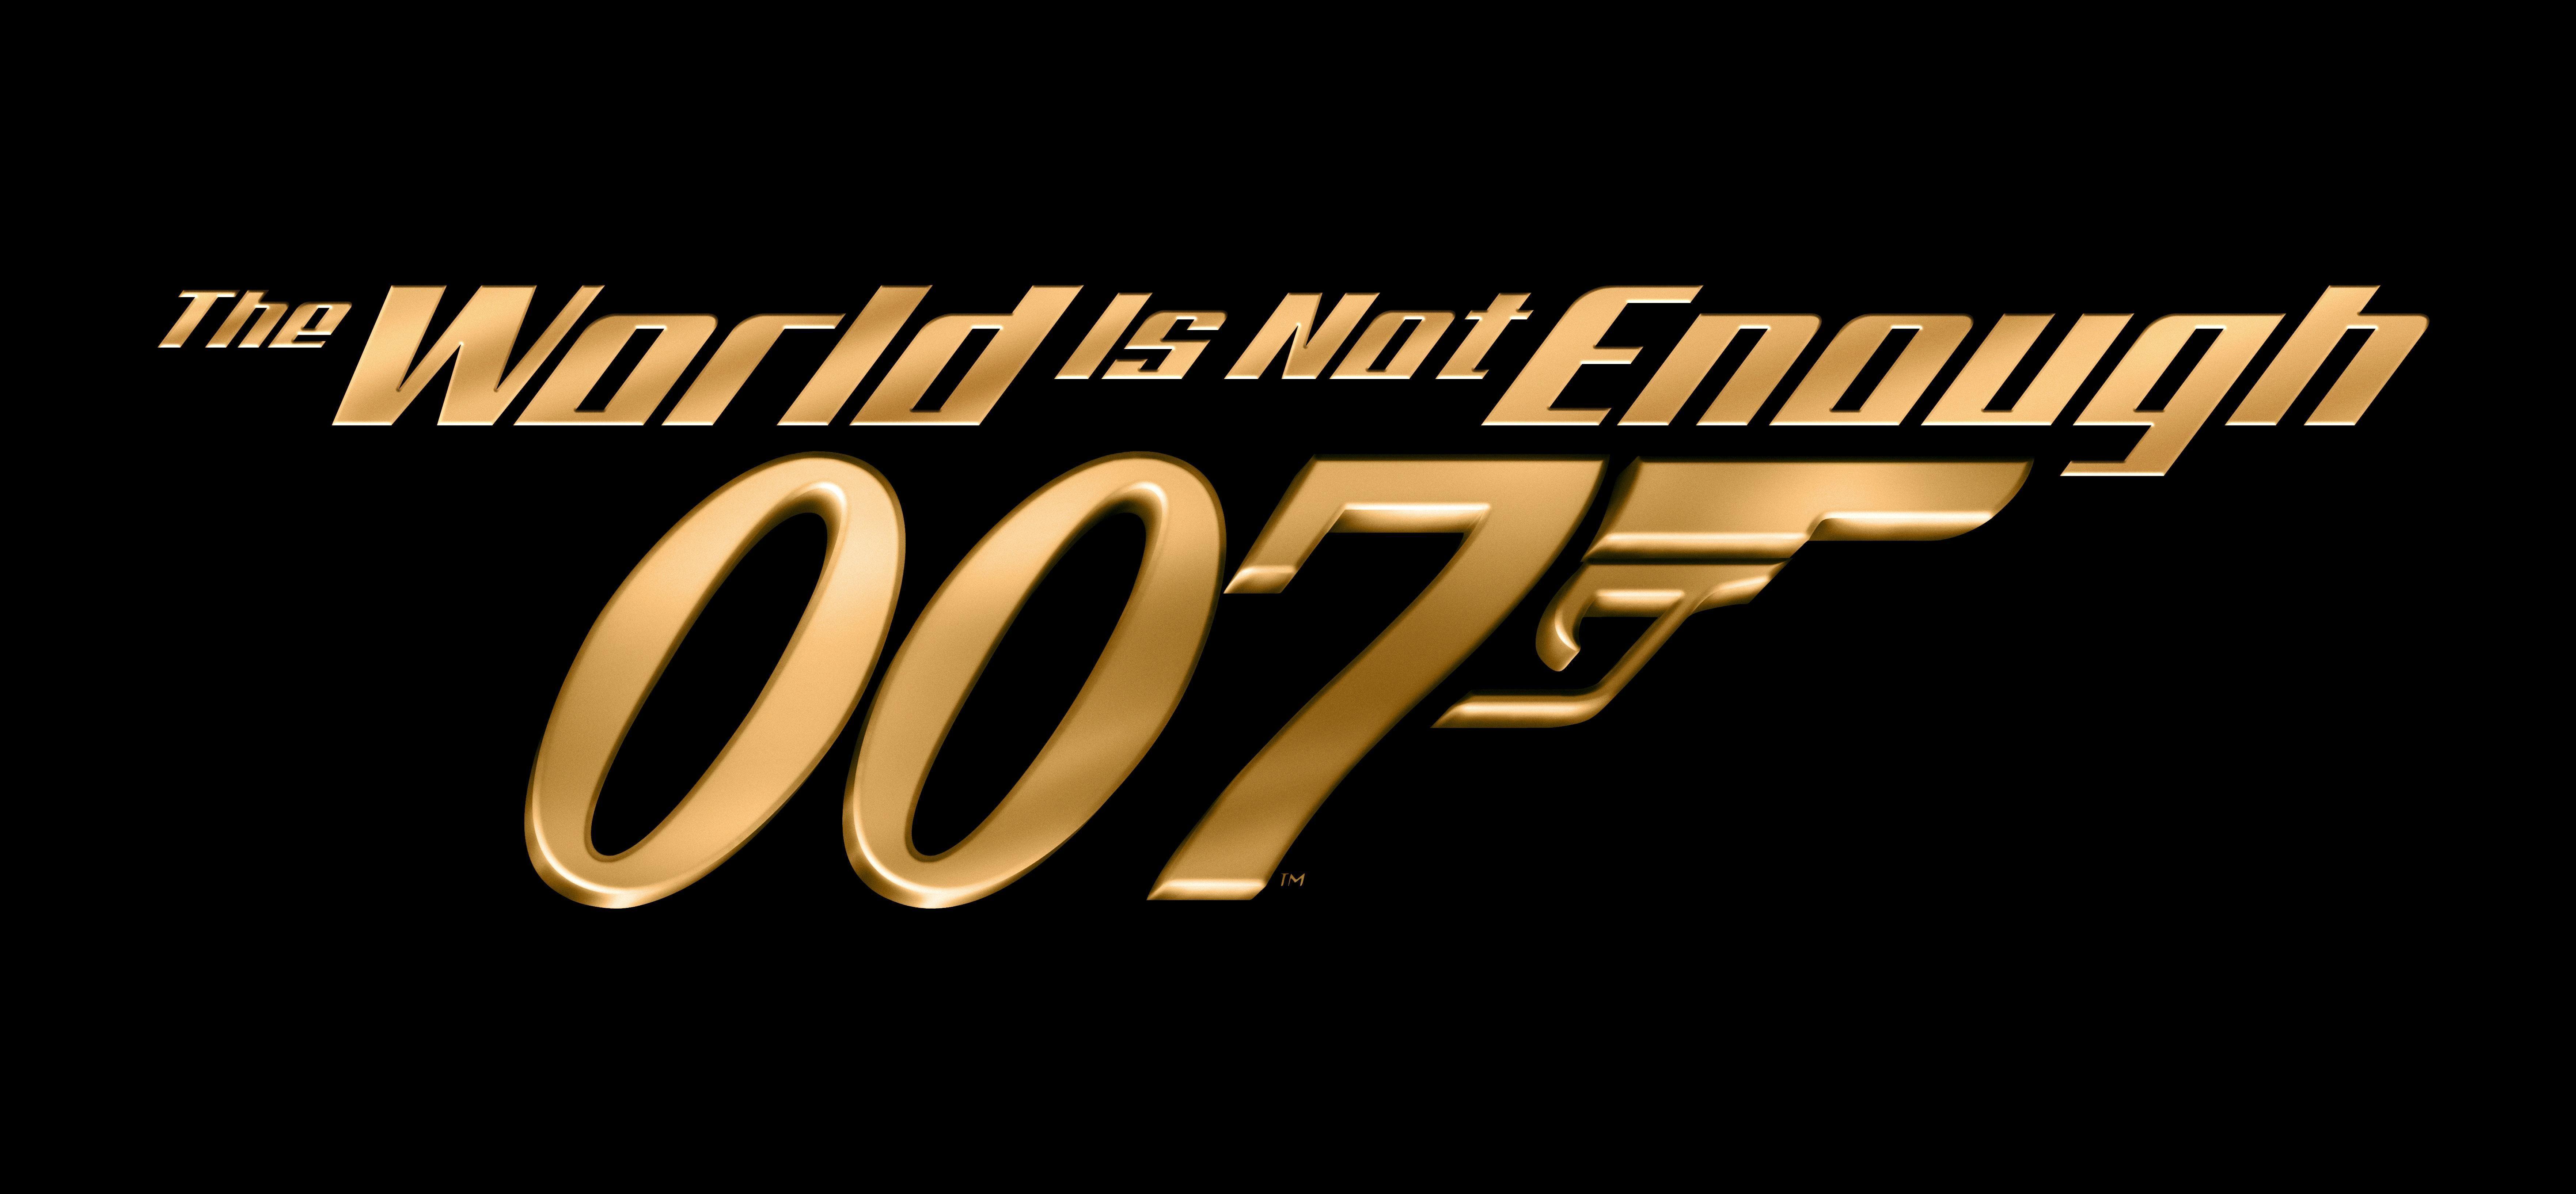 007 007 With Microsoft James Bond Microsoft James Bond Bond Tech Company Logos